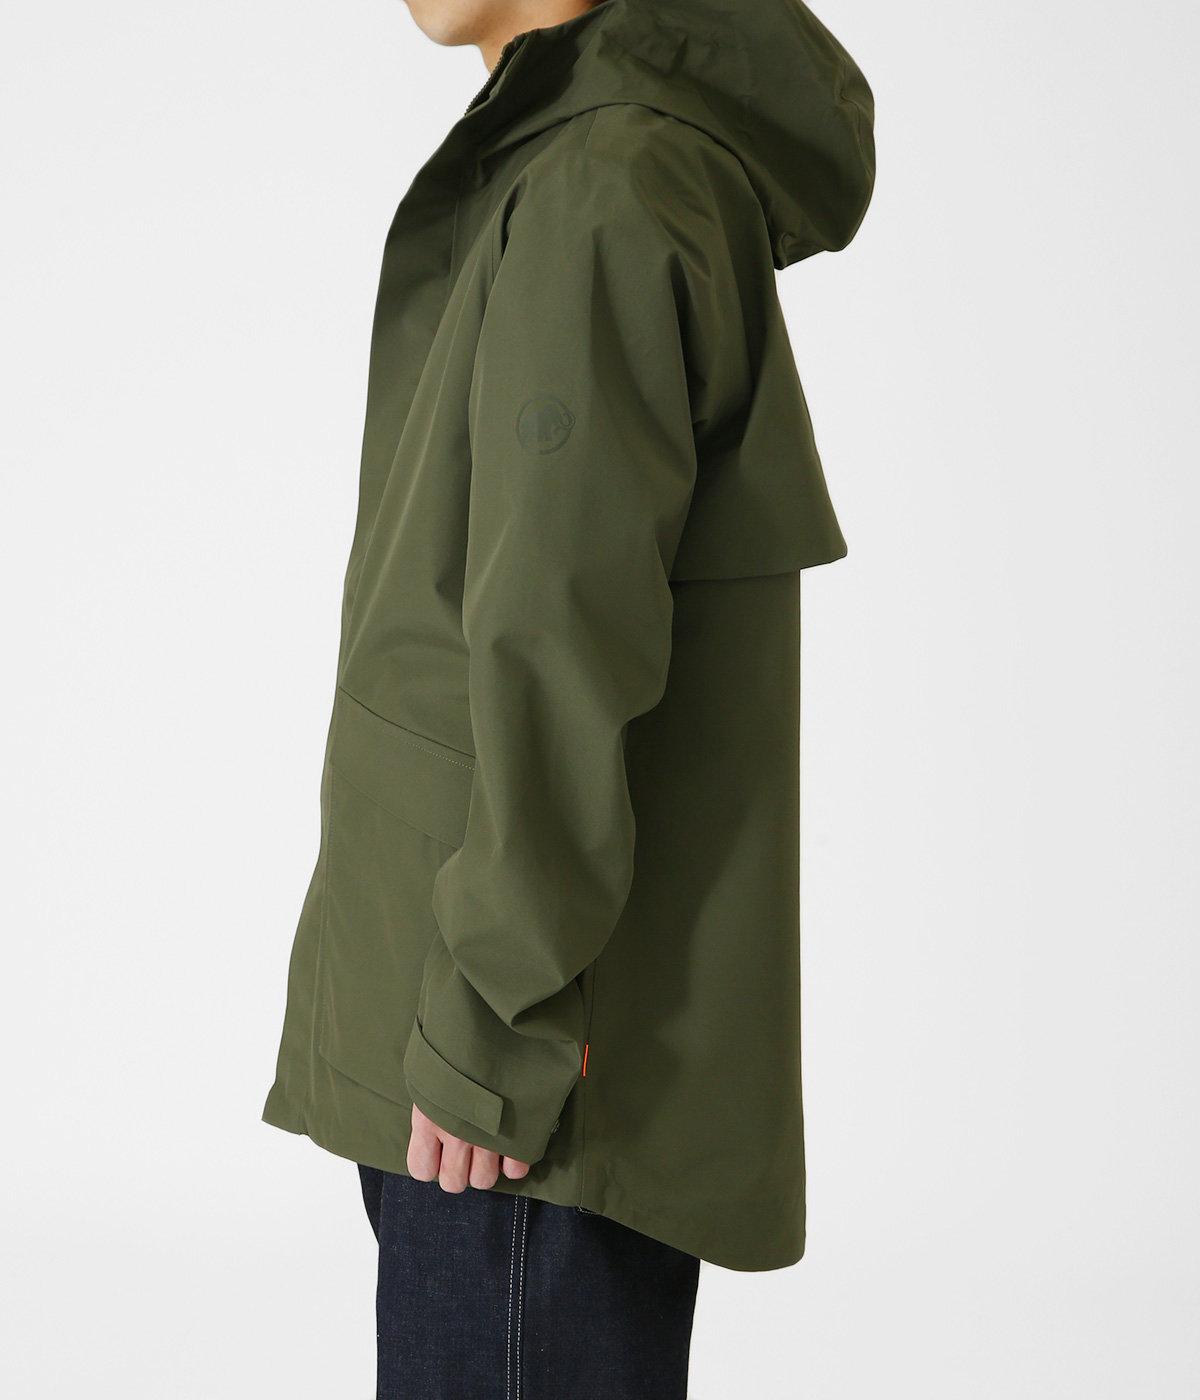 Mammut 3L HS Hooded Jacket Men